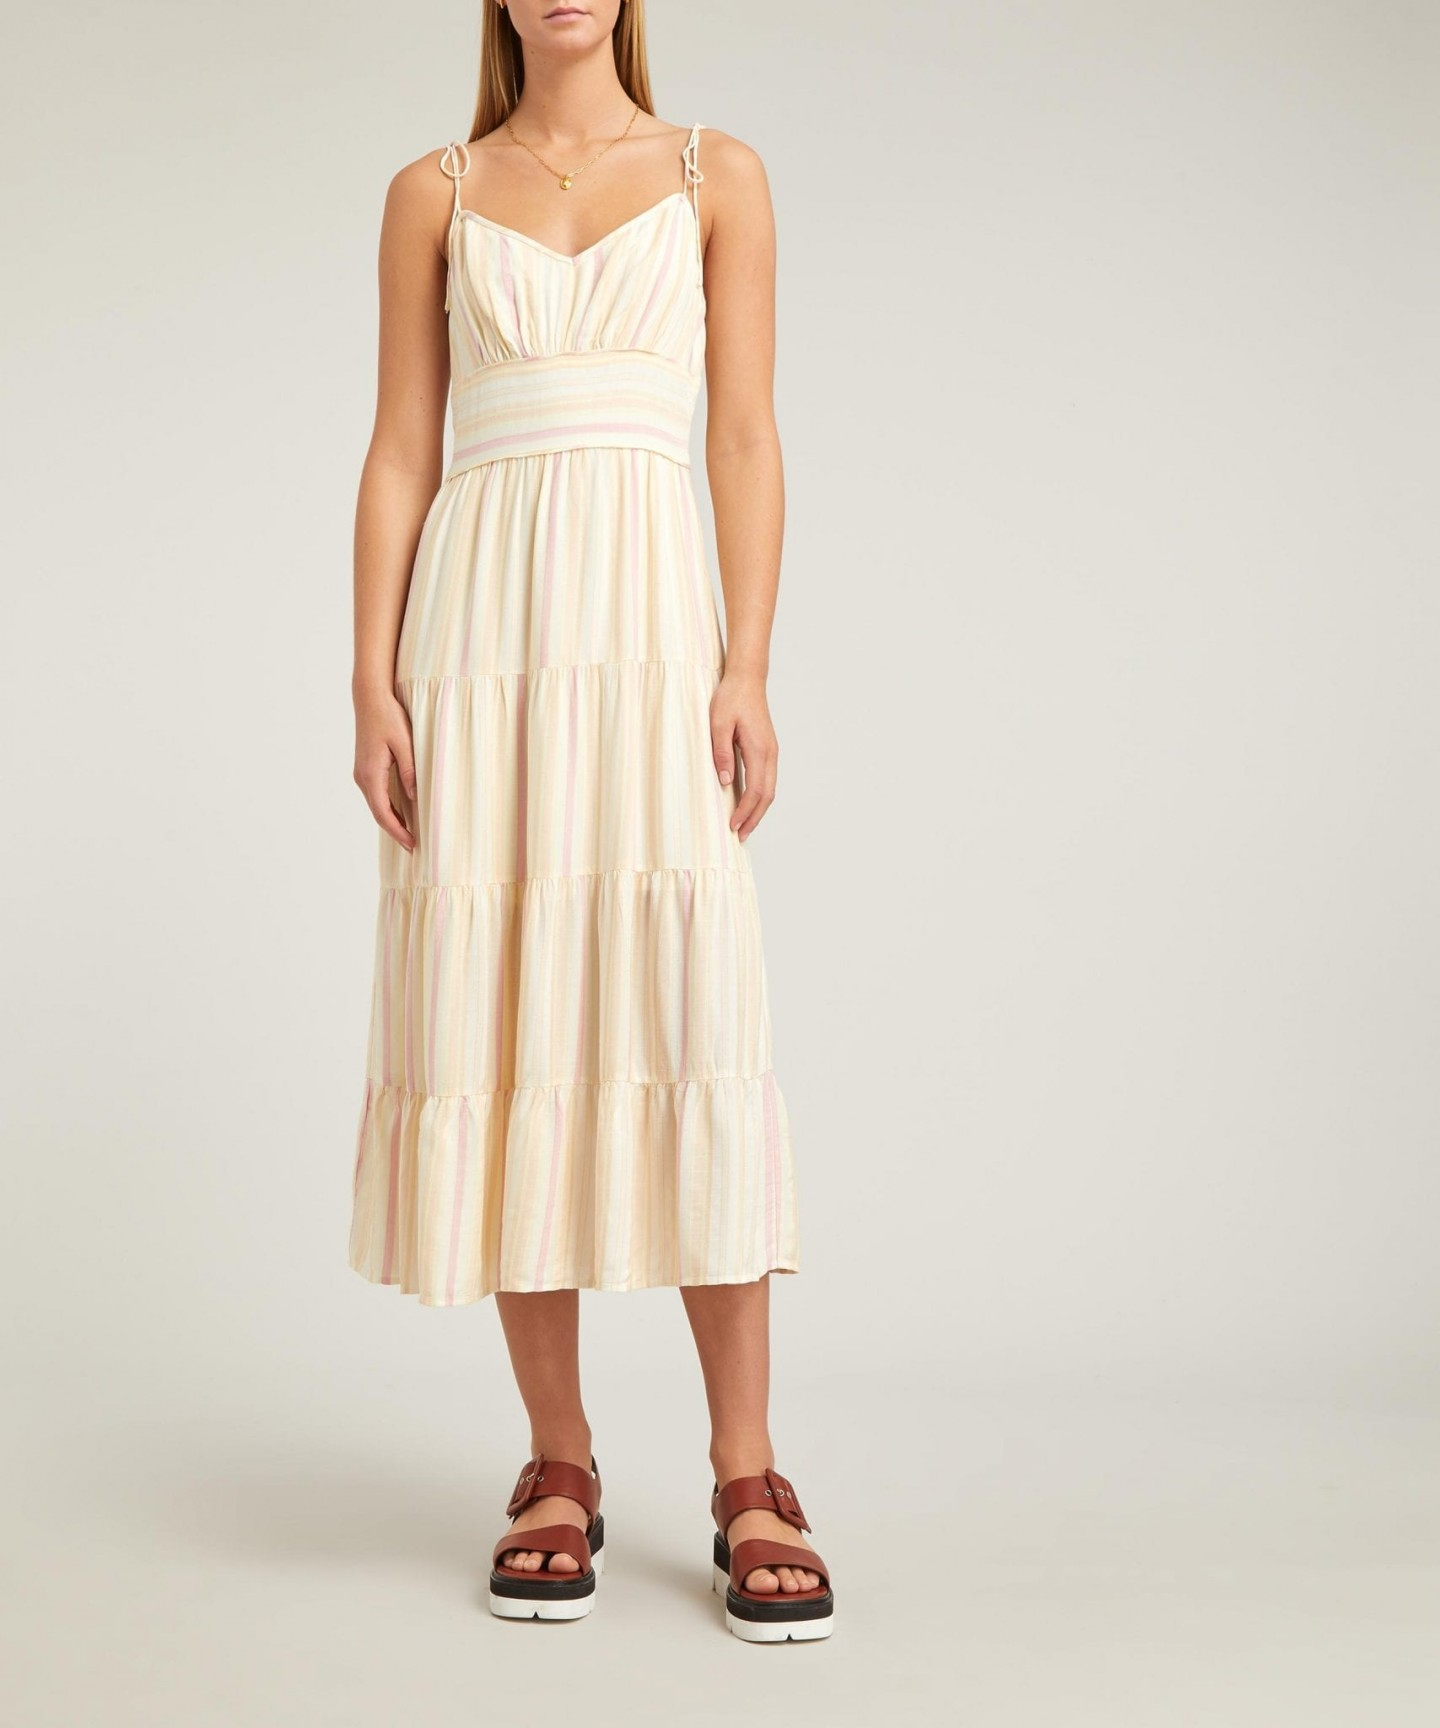 PAIGE Favella Striped Dress